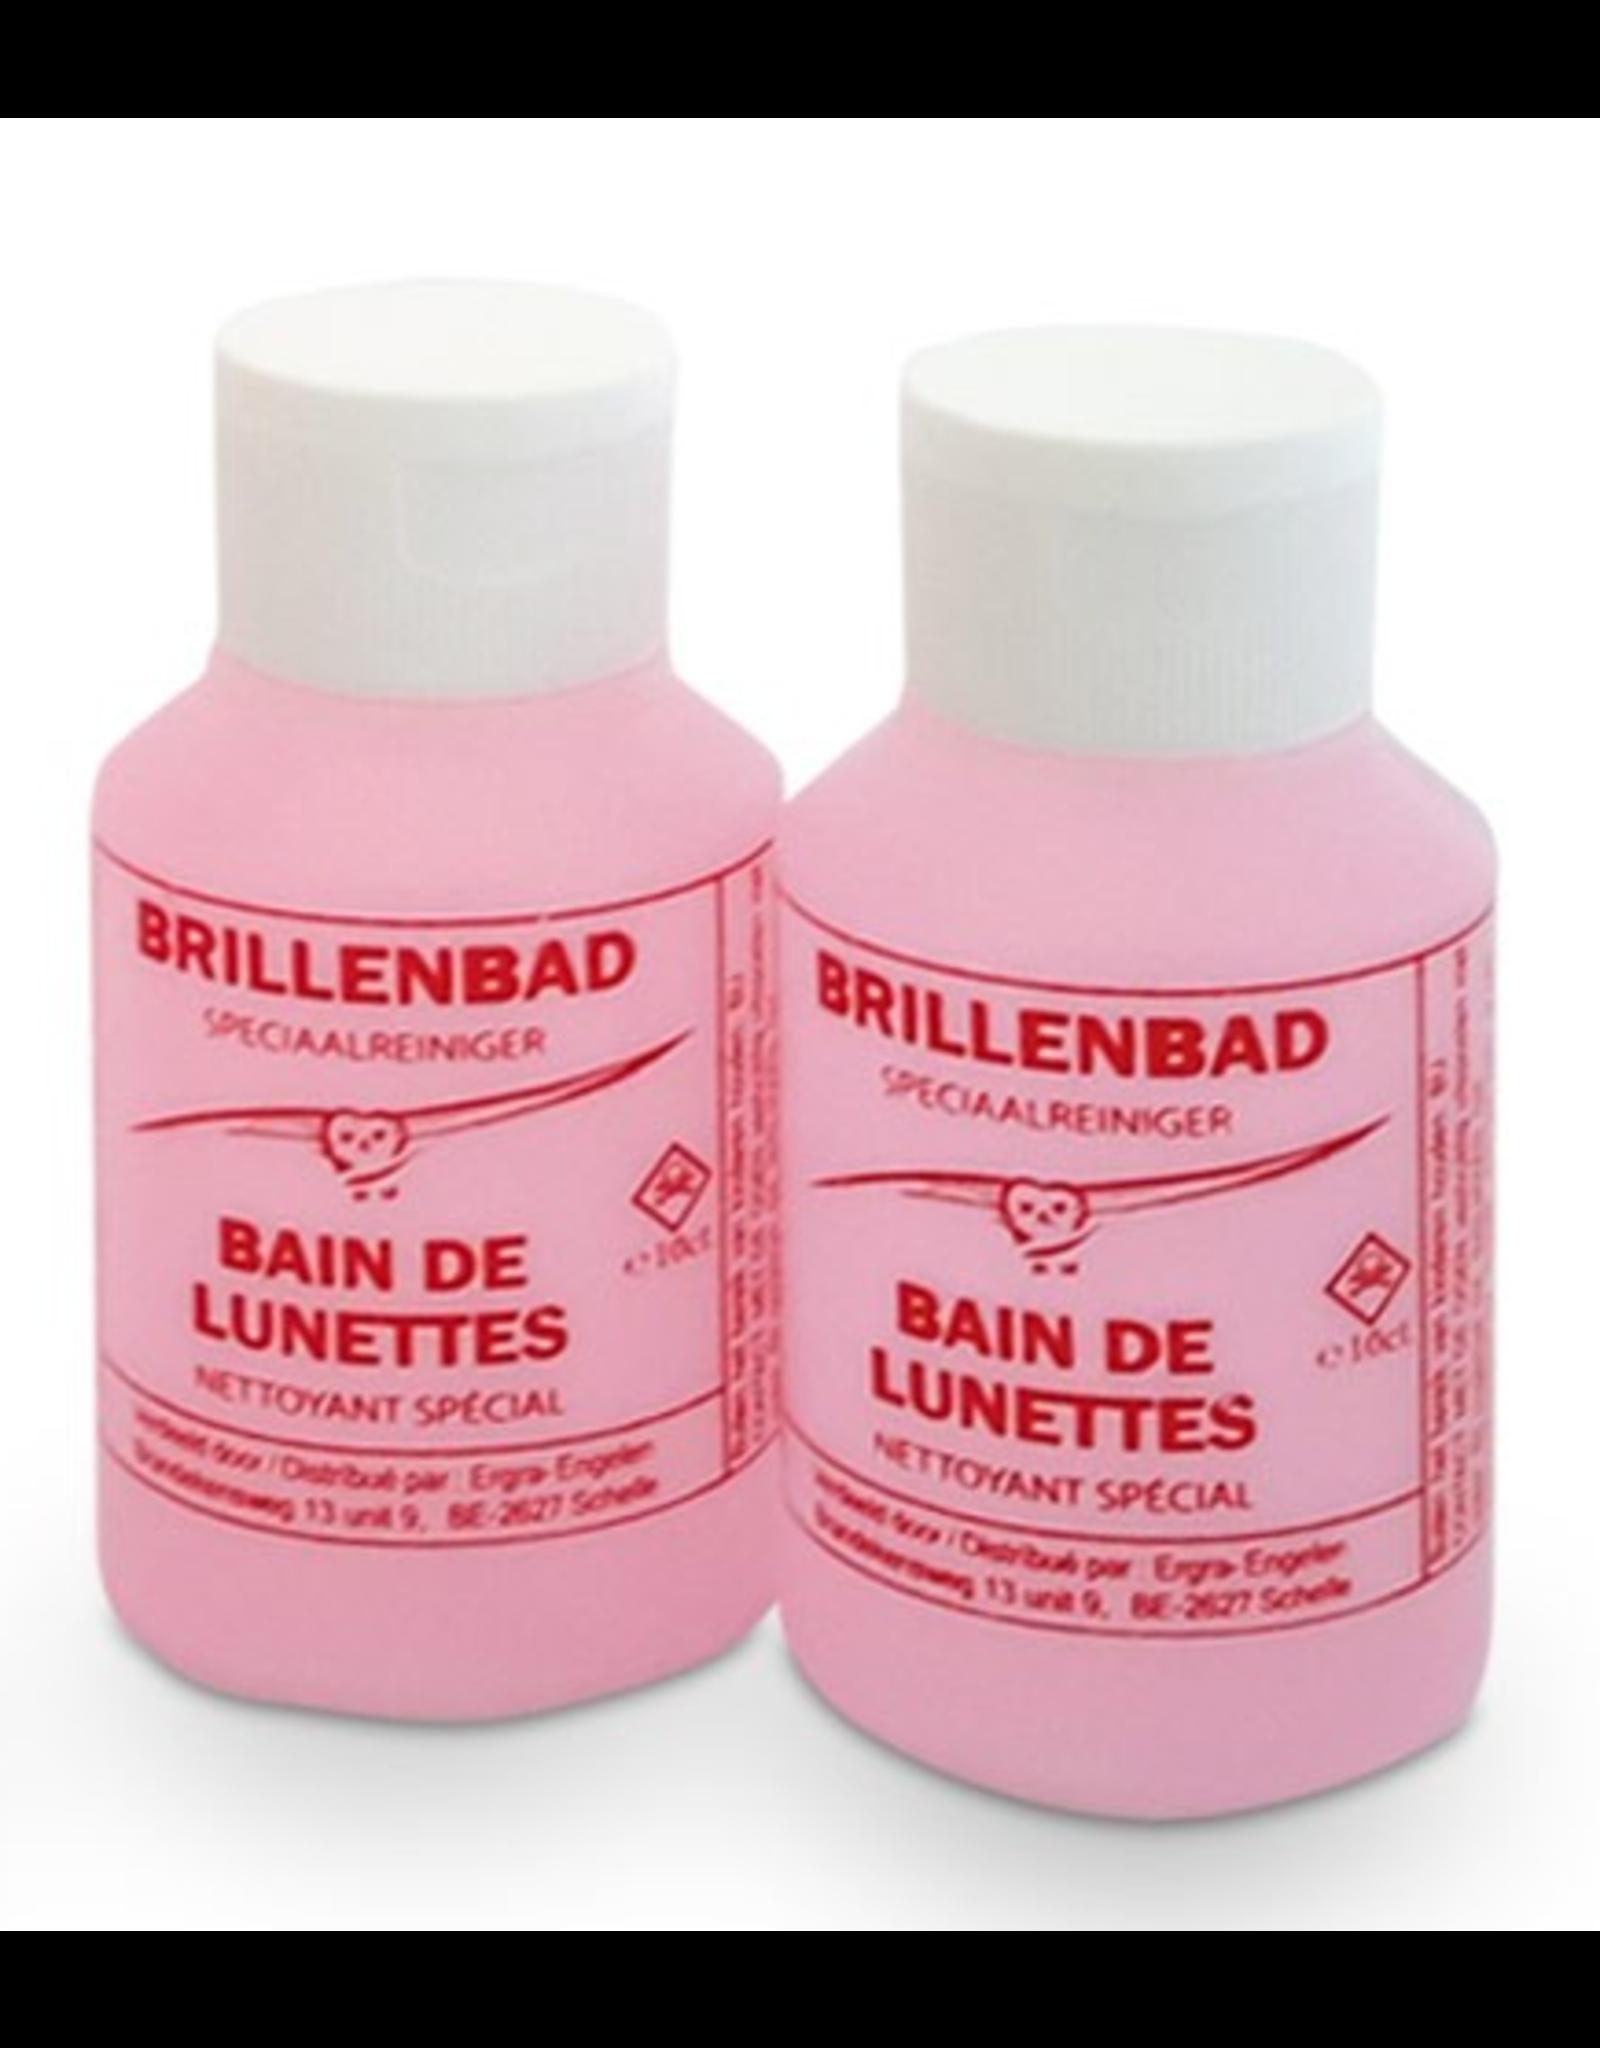 Brilatelier - Accessoires Brillenbad - Vulling